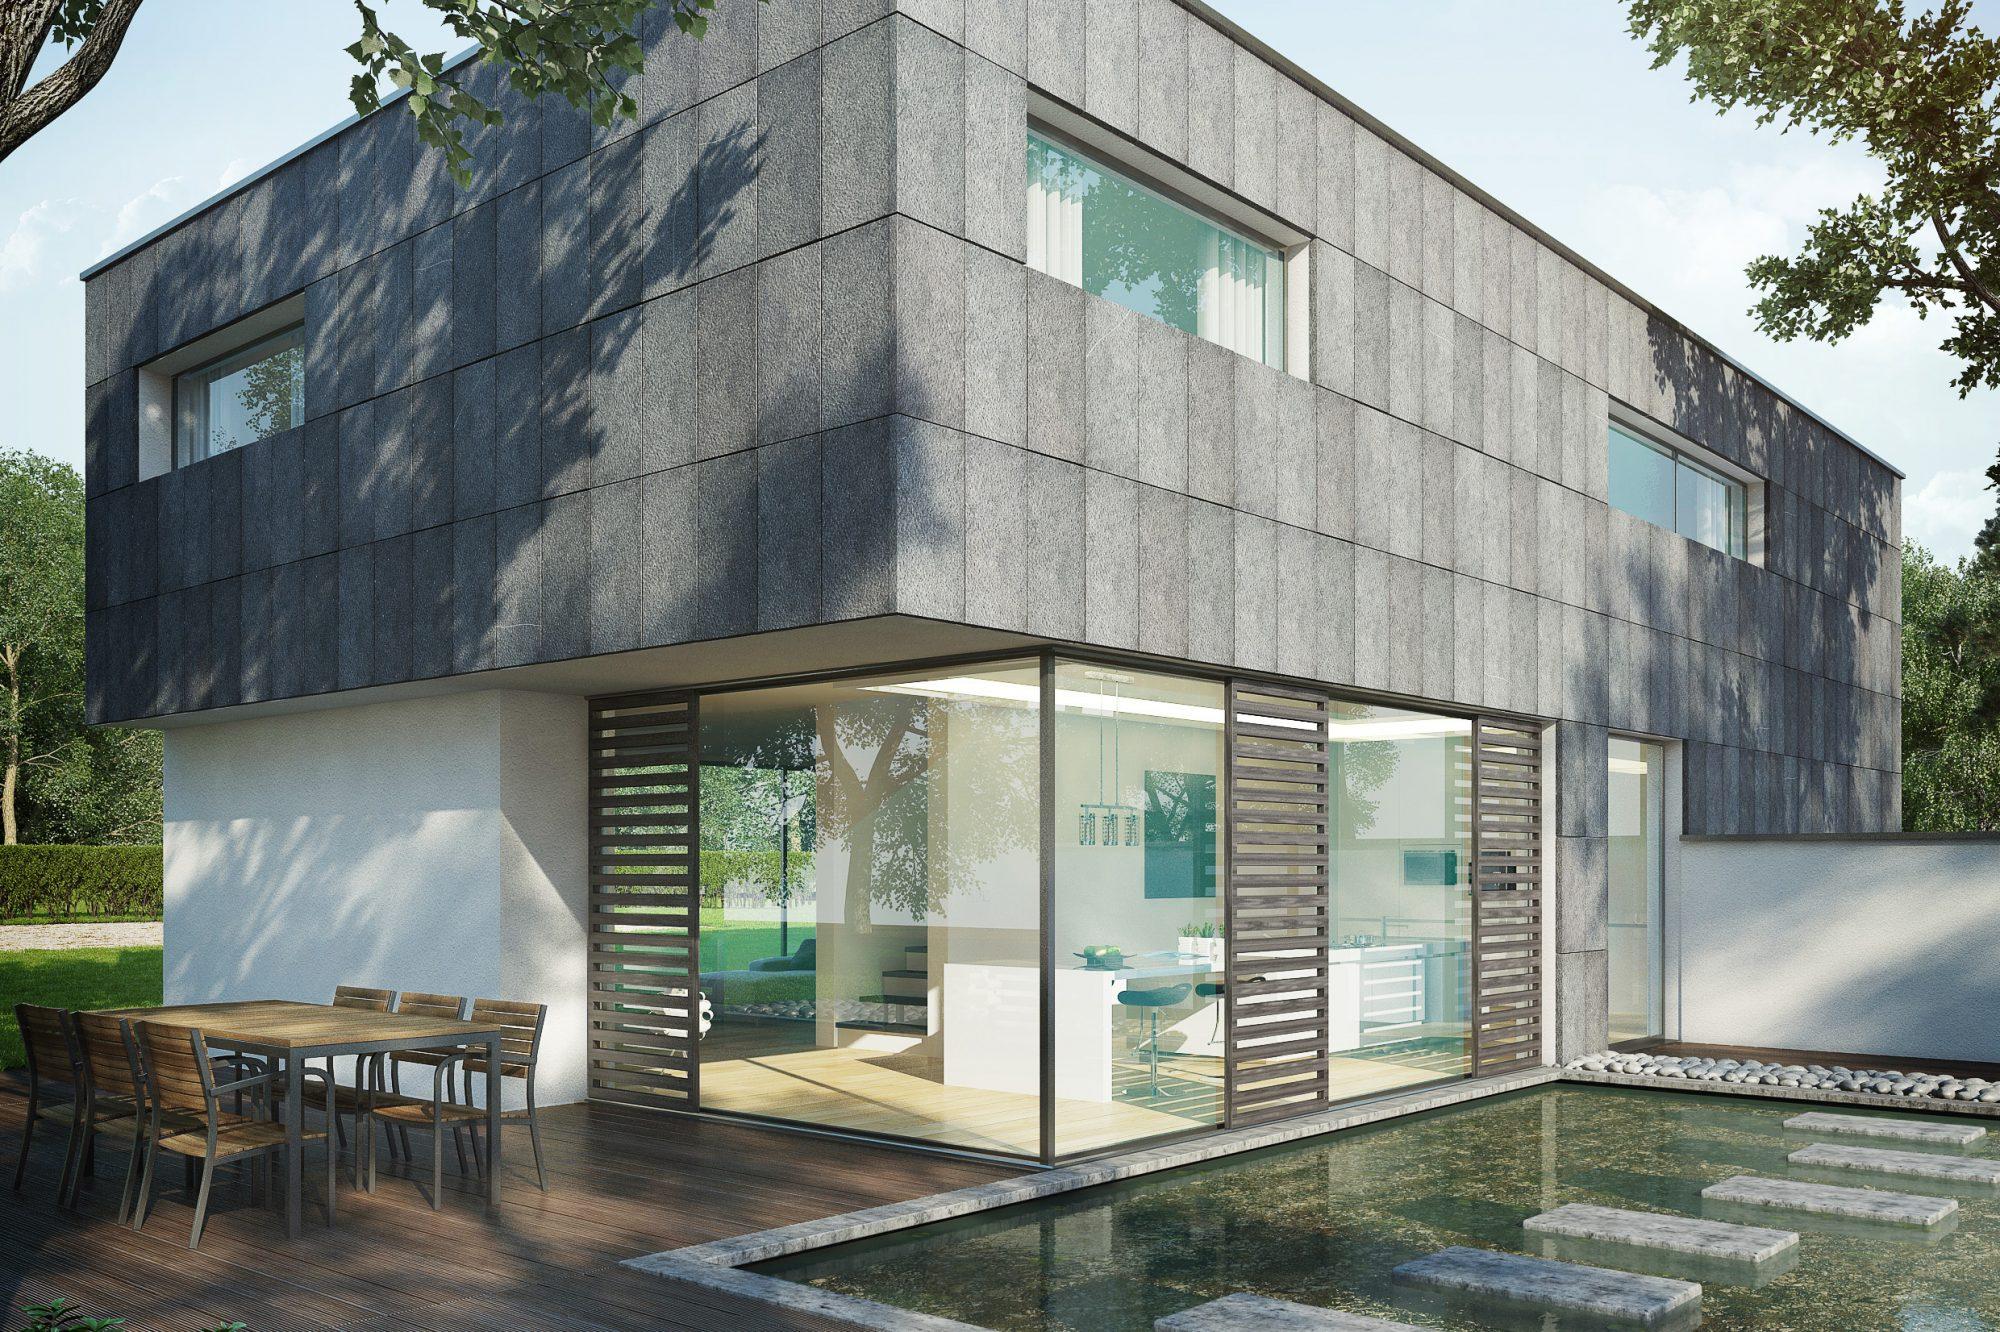 21 Pierre Bleue Belge - facade - Spuntato